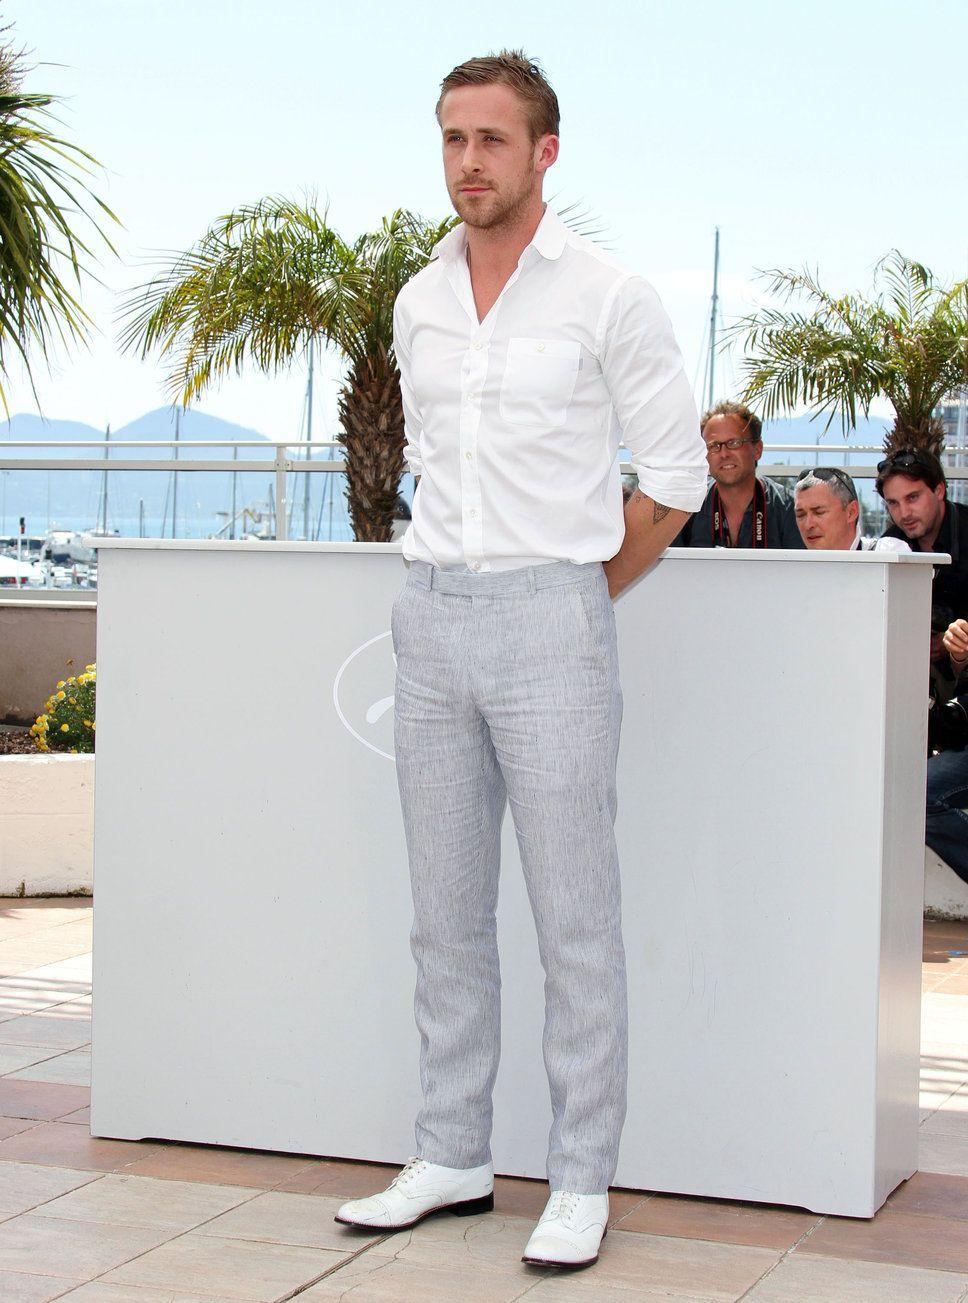 ryan gosling linen pants - Google Search | Minimalist Style ...